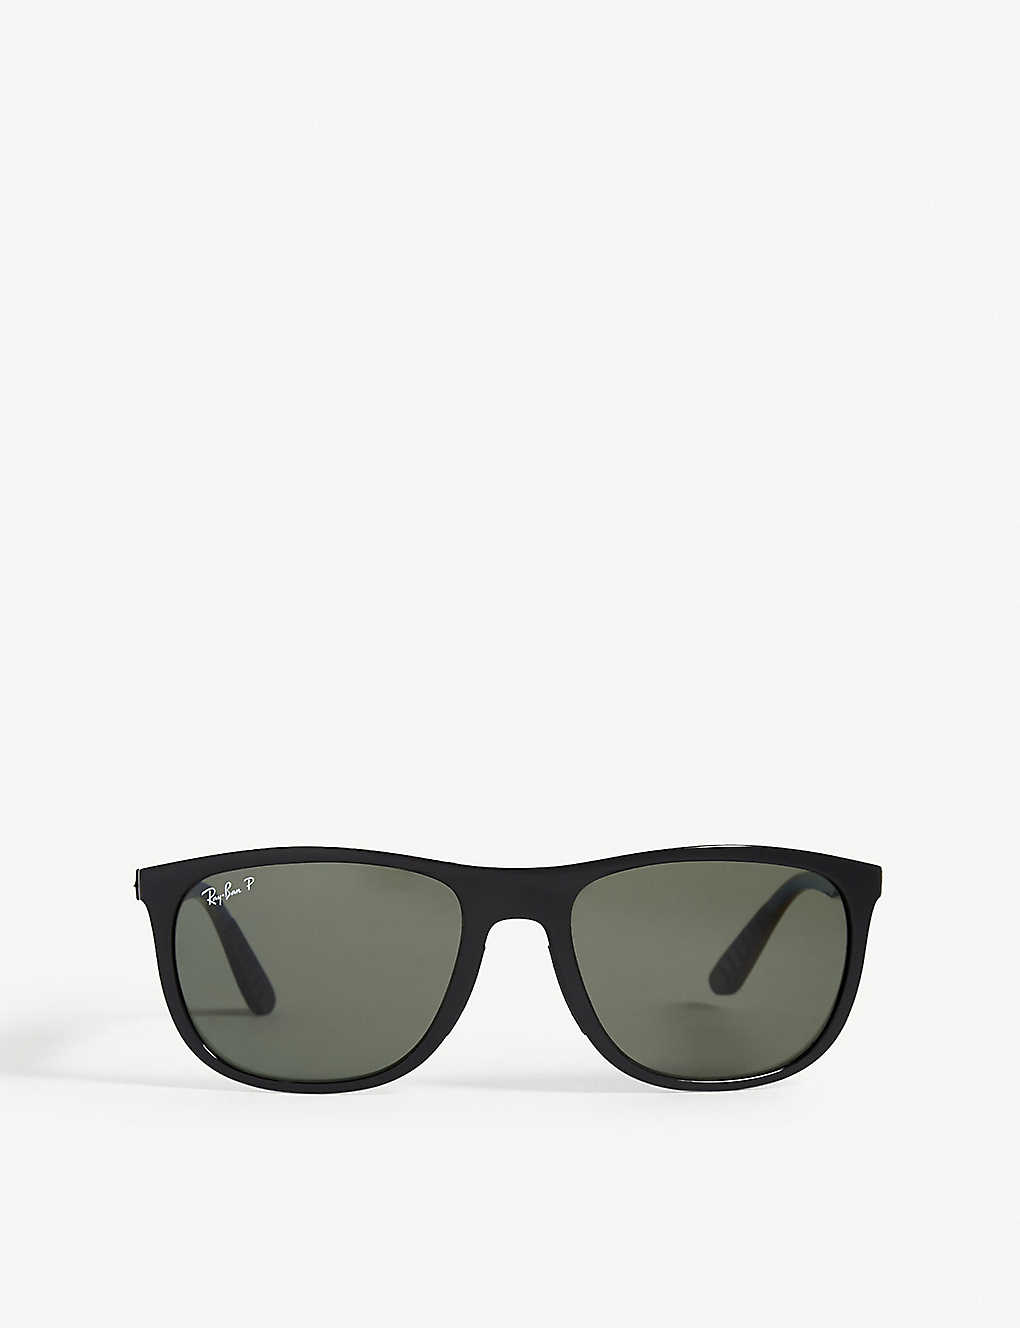 f5c747e44ce RAY-BAN - Rb3716 Clubmaster square-frame sunglasses